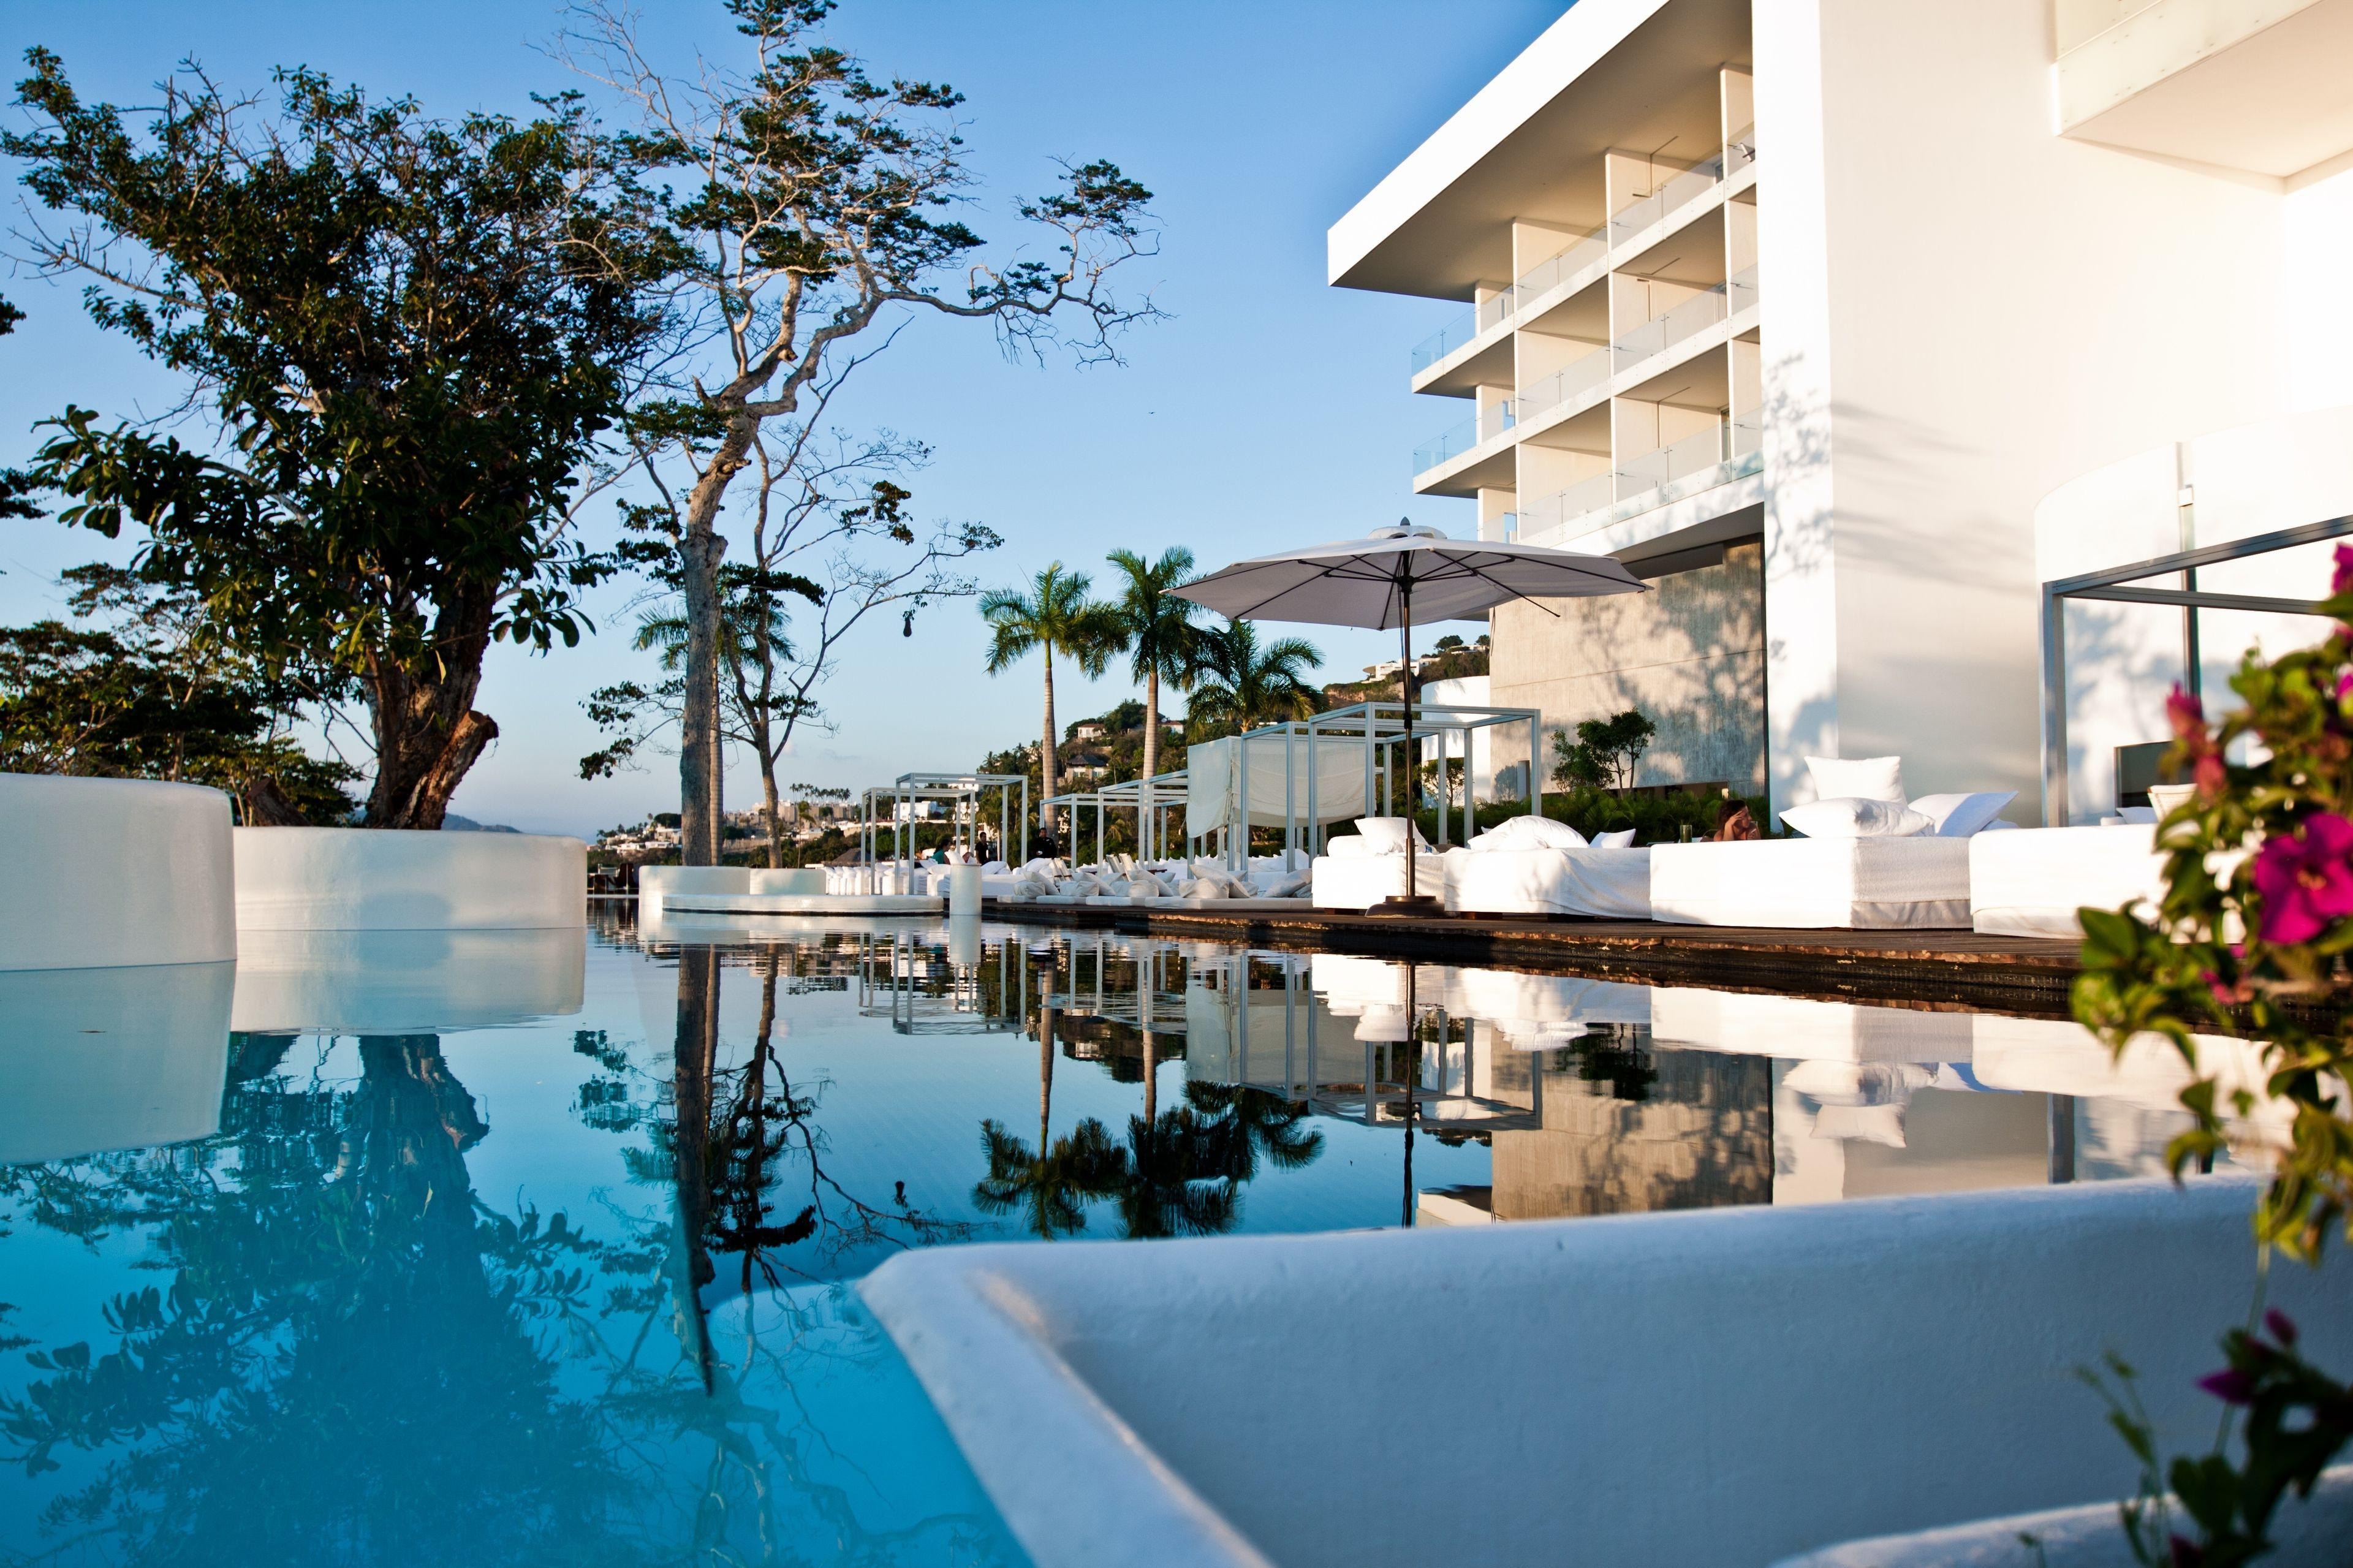 Courtesy of Hotel Encanto, Acapulco / Expedia